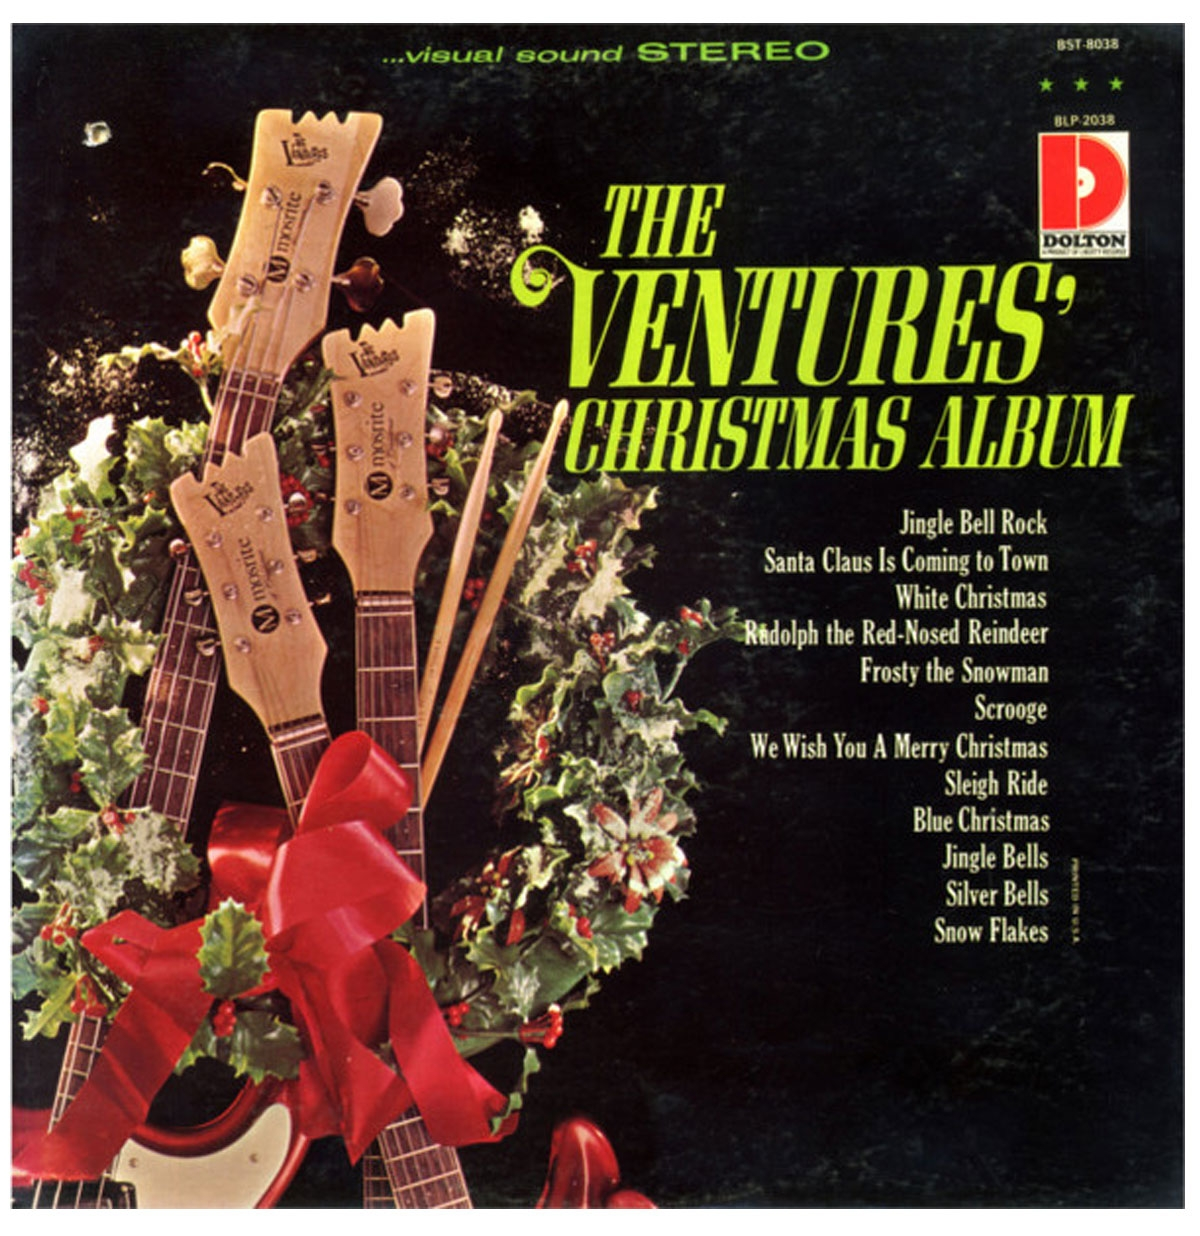 The Ventures - Christmas Album LP